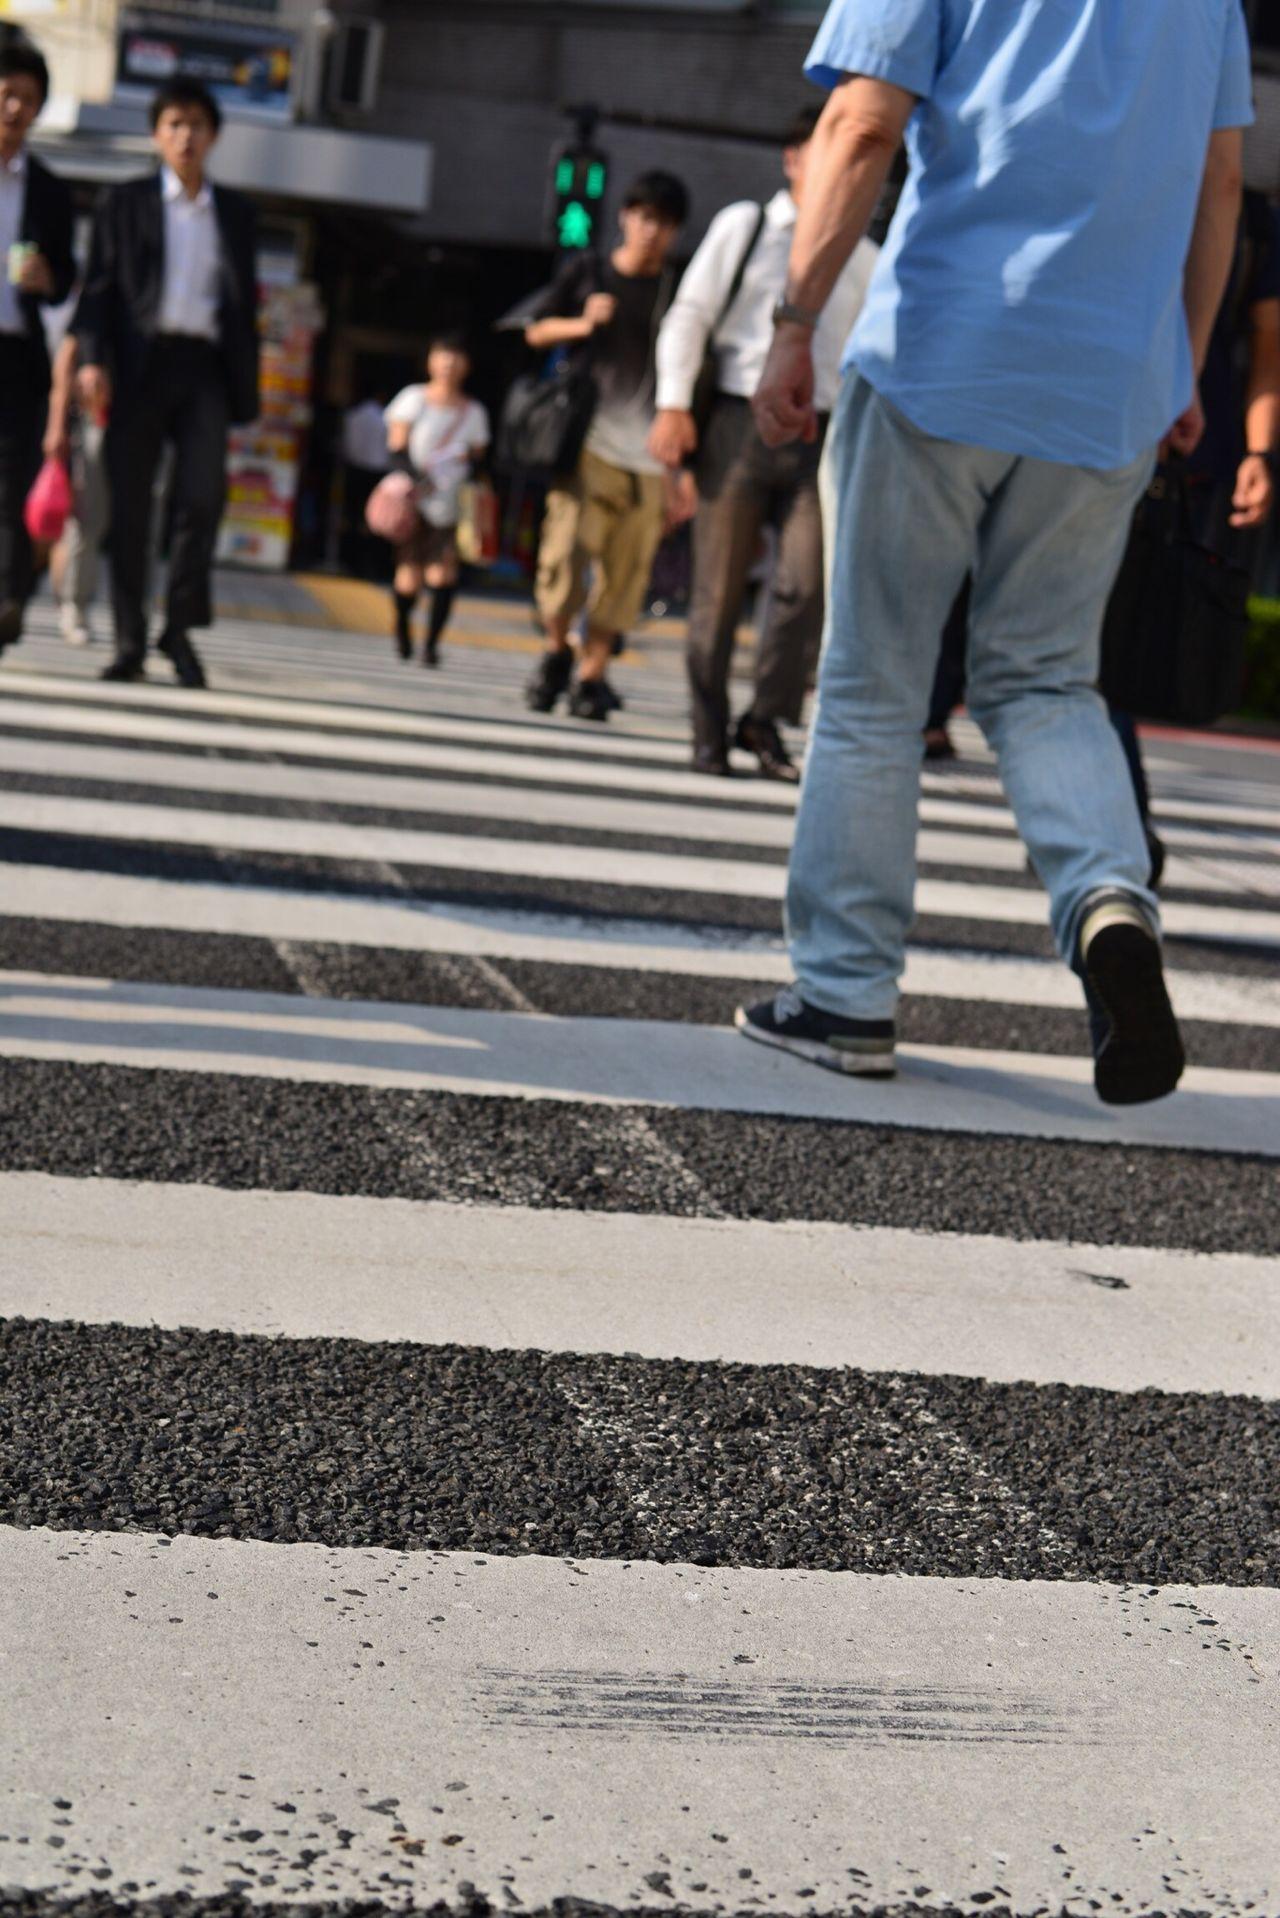 Beautiful stock photos of zebra, City, City life, Color Image, Commuter